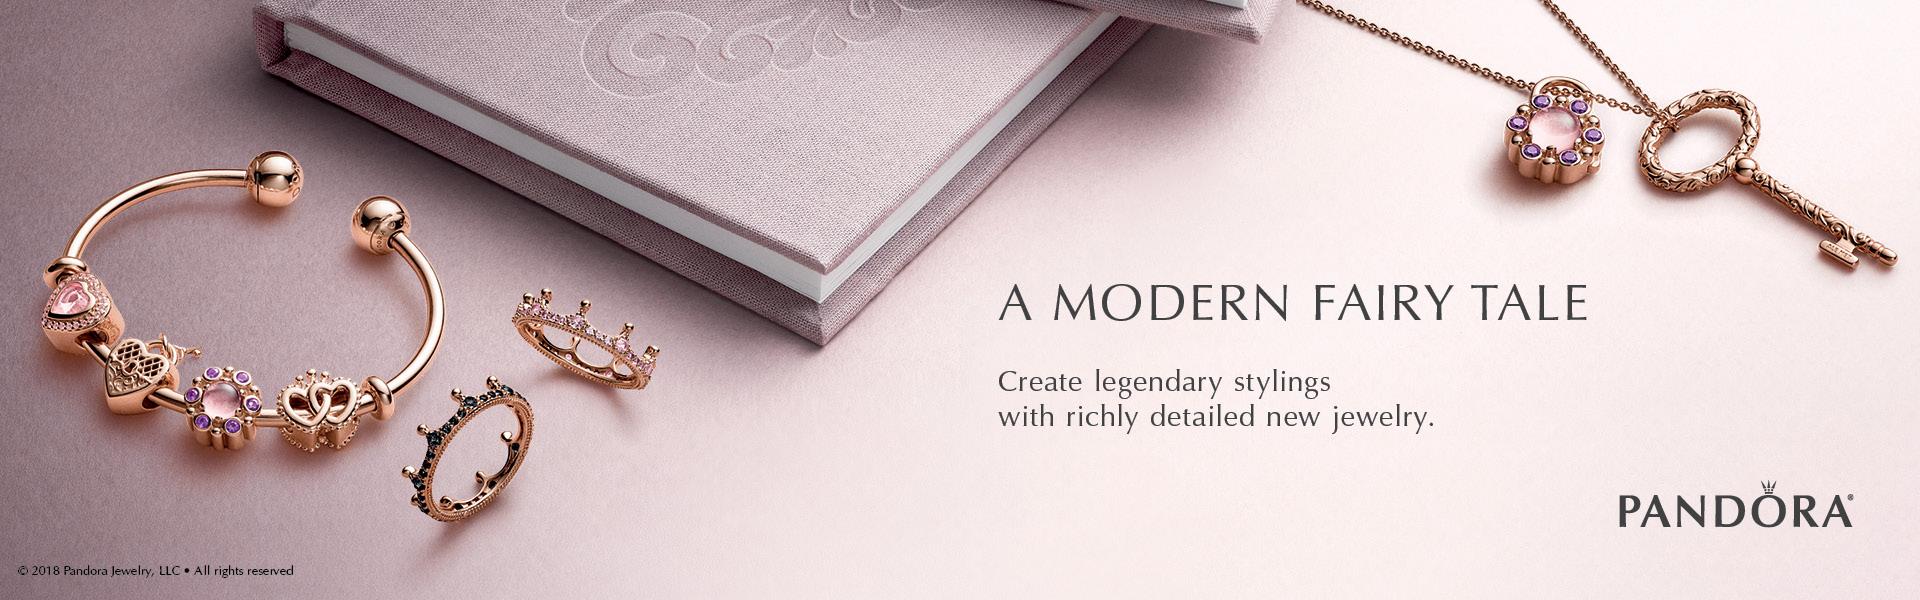 Pandora A Modern Fairy Tale